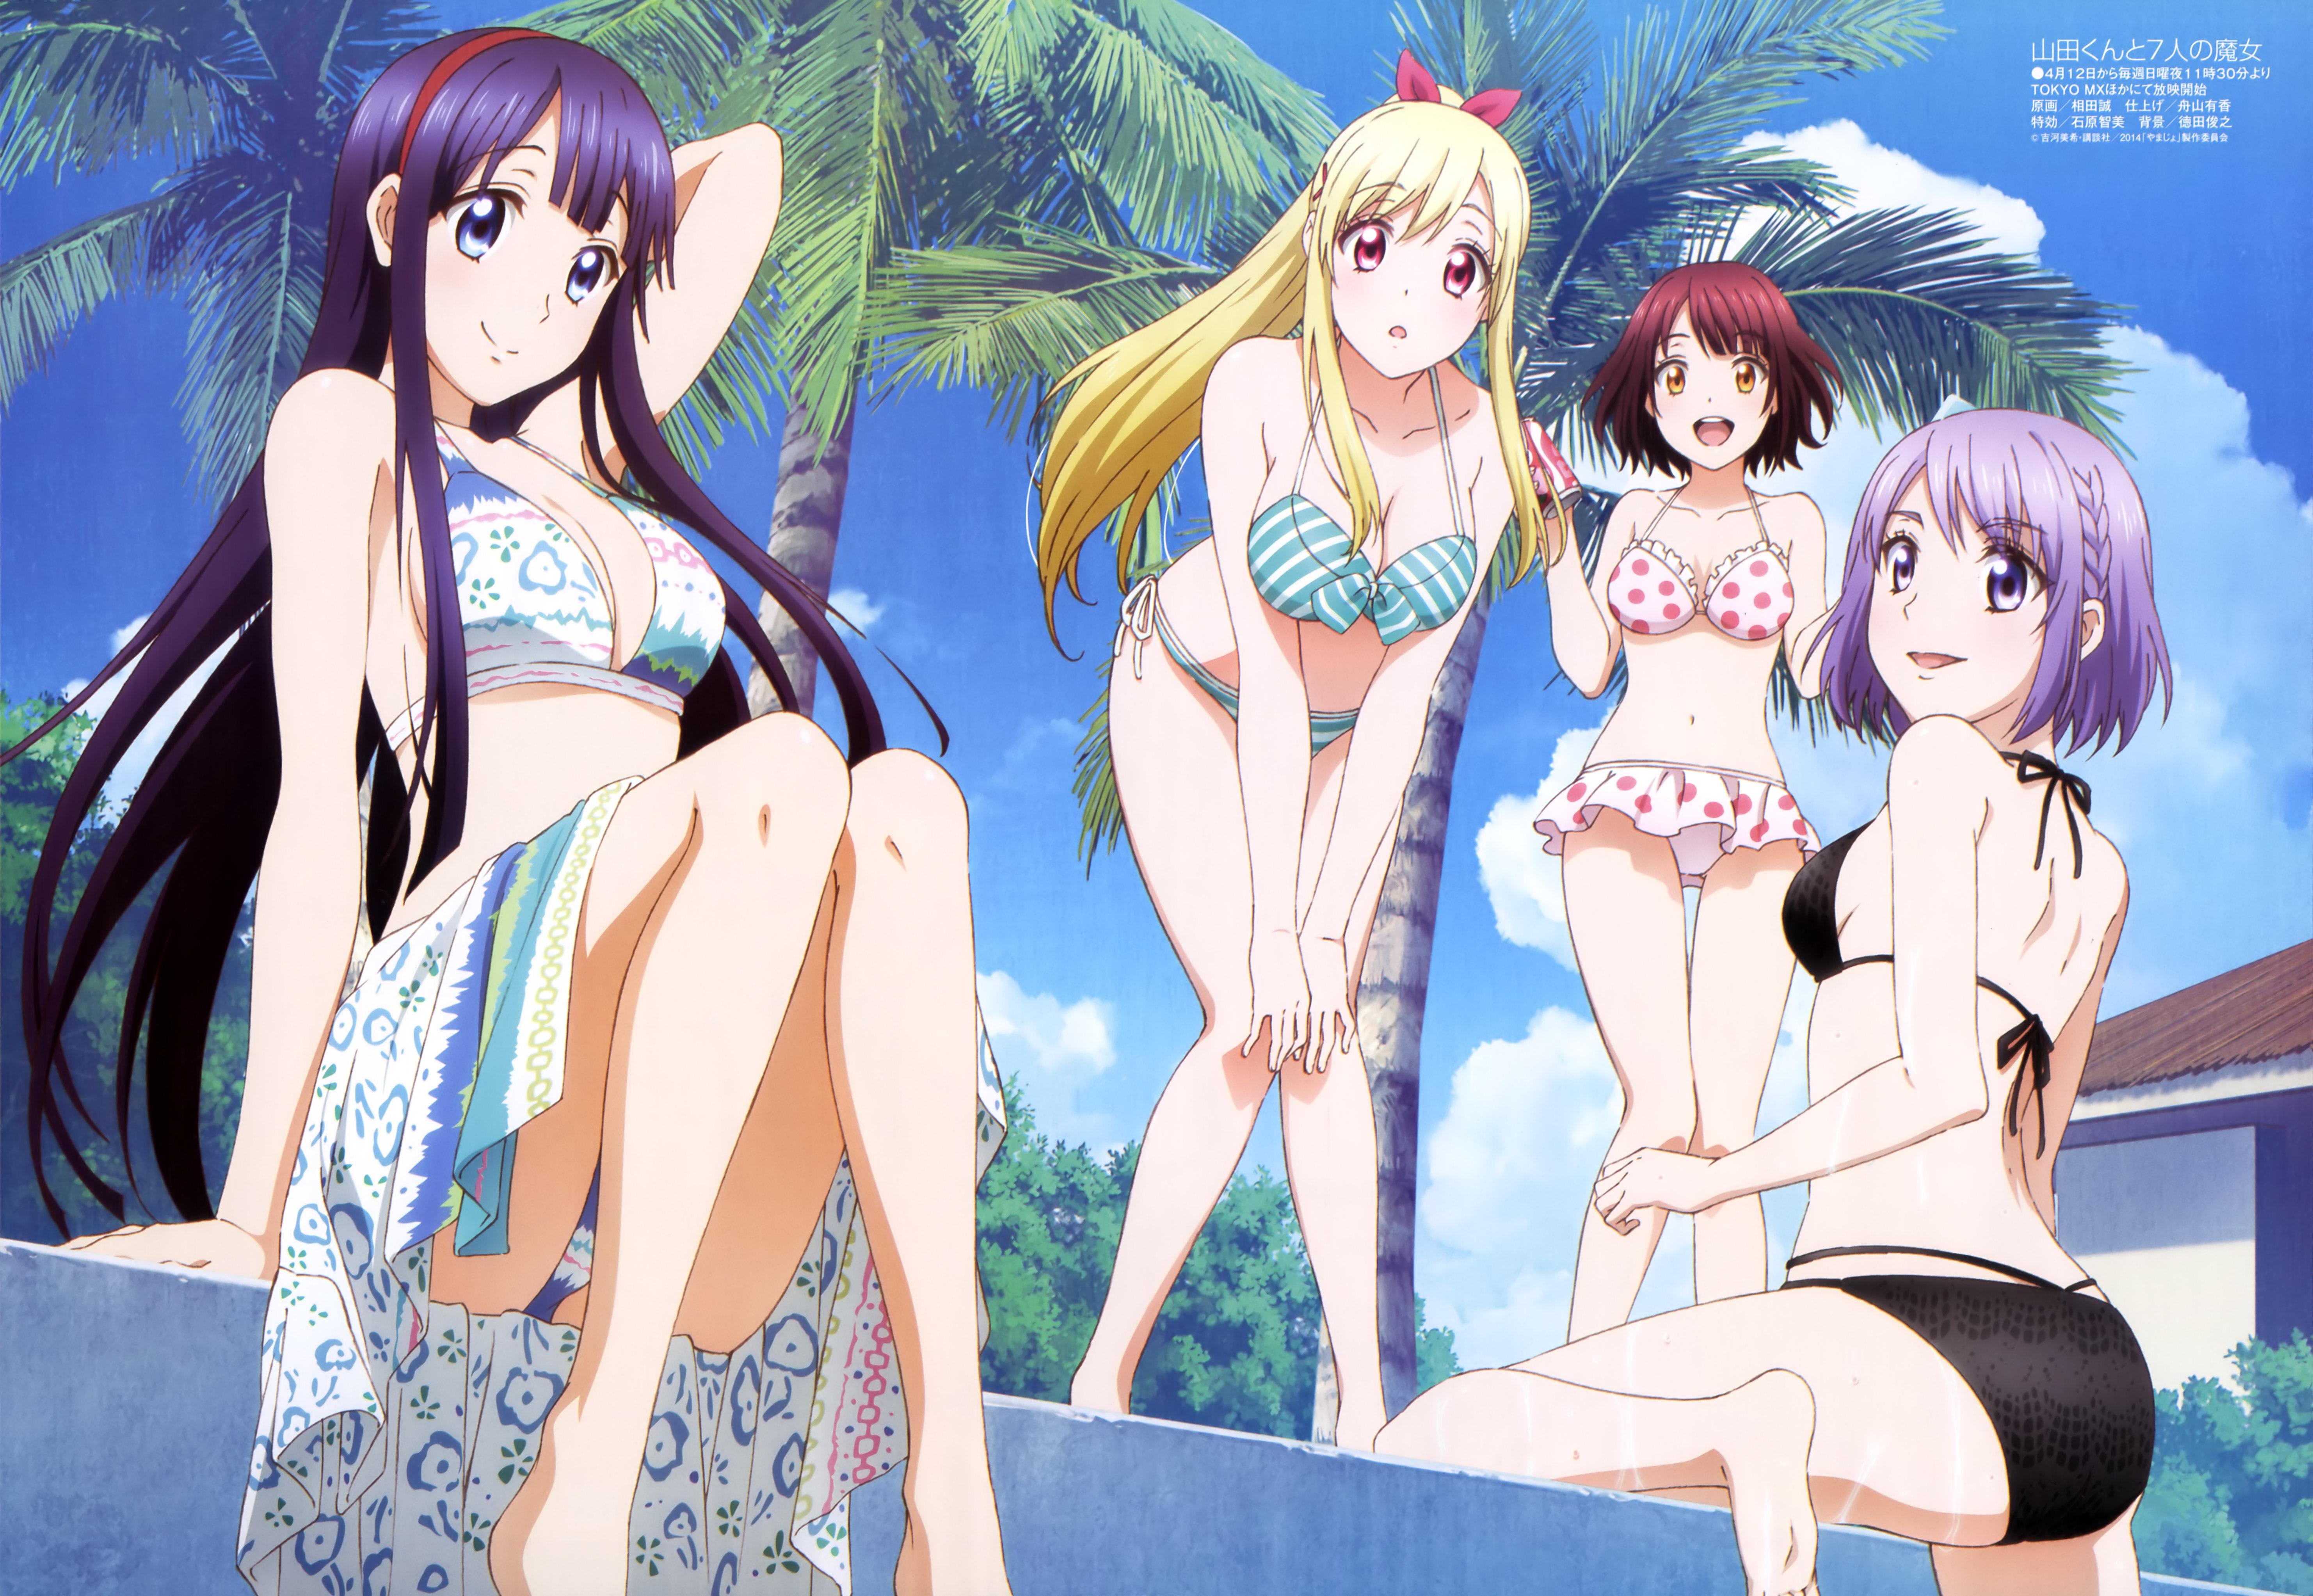 Megami MAGAZINE May 2015 anime posters yamada-kun to 7-nin no majo asuka mikoto itou miyabi odagirl nene shiraishi urara poster